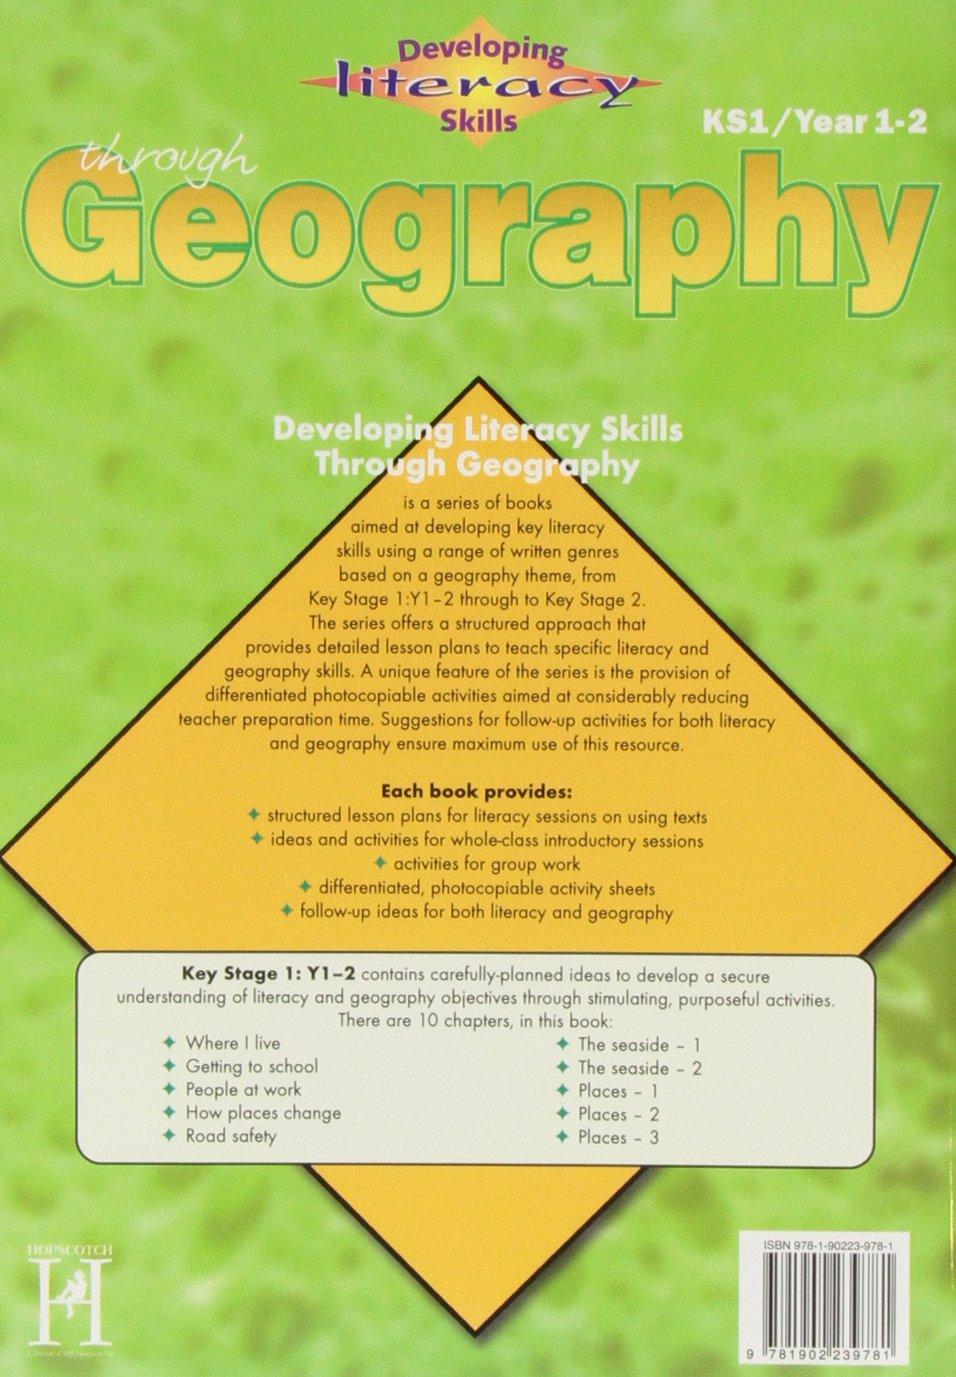 Developing Literacy Skills Through Geography Ks1 Year 1 2 Mackay Frances 9781902239781 Amazon Com Books Perhaps you could teach them. amazon com